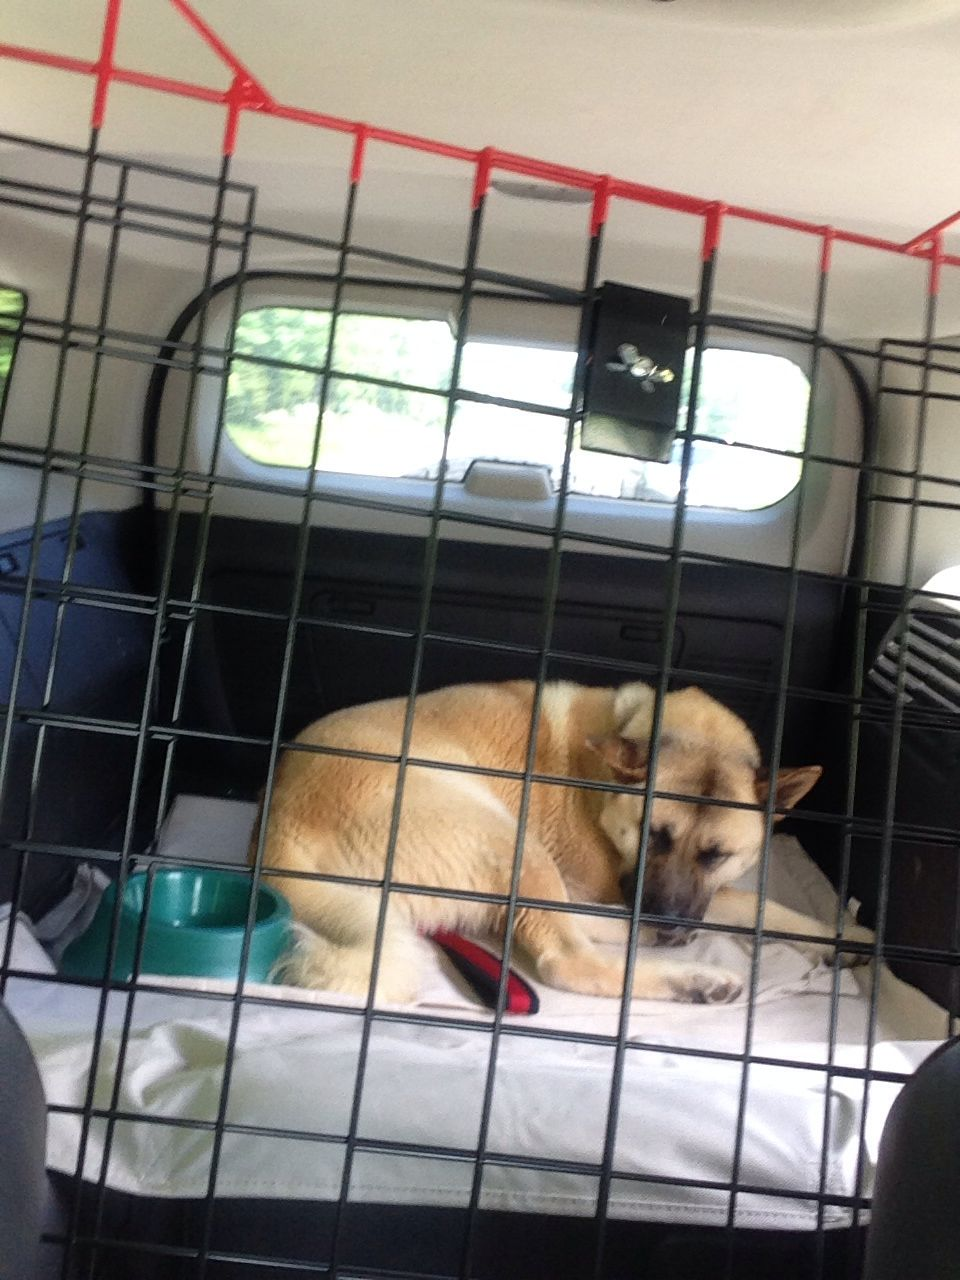 Sundance rescued on 52414 from Pulaski County Animal